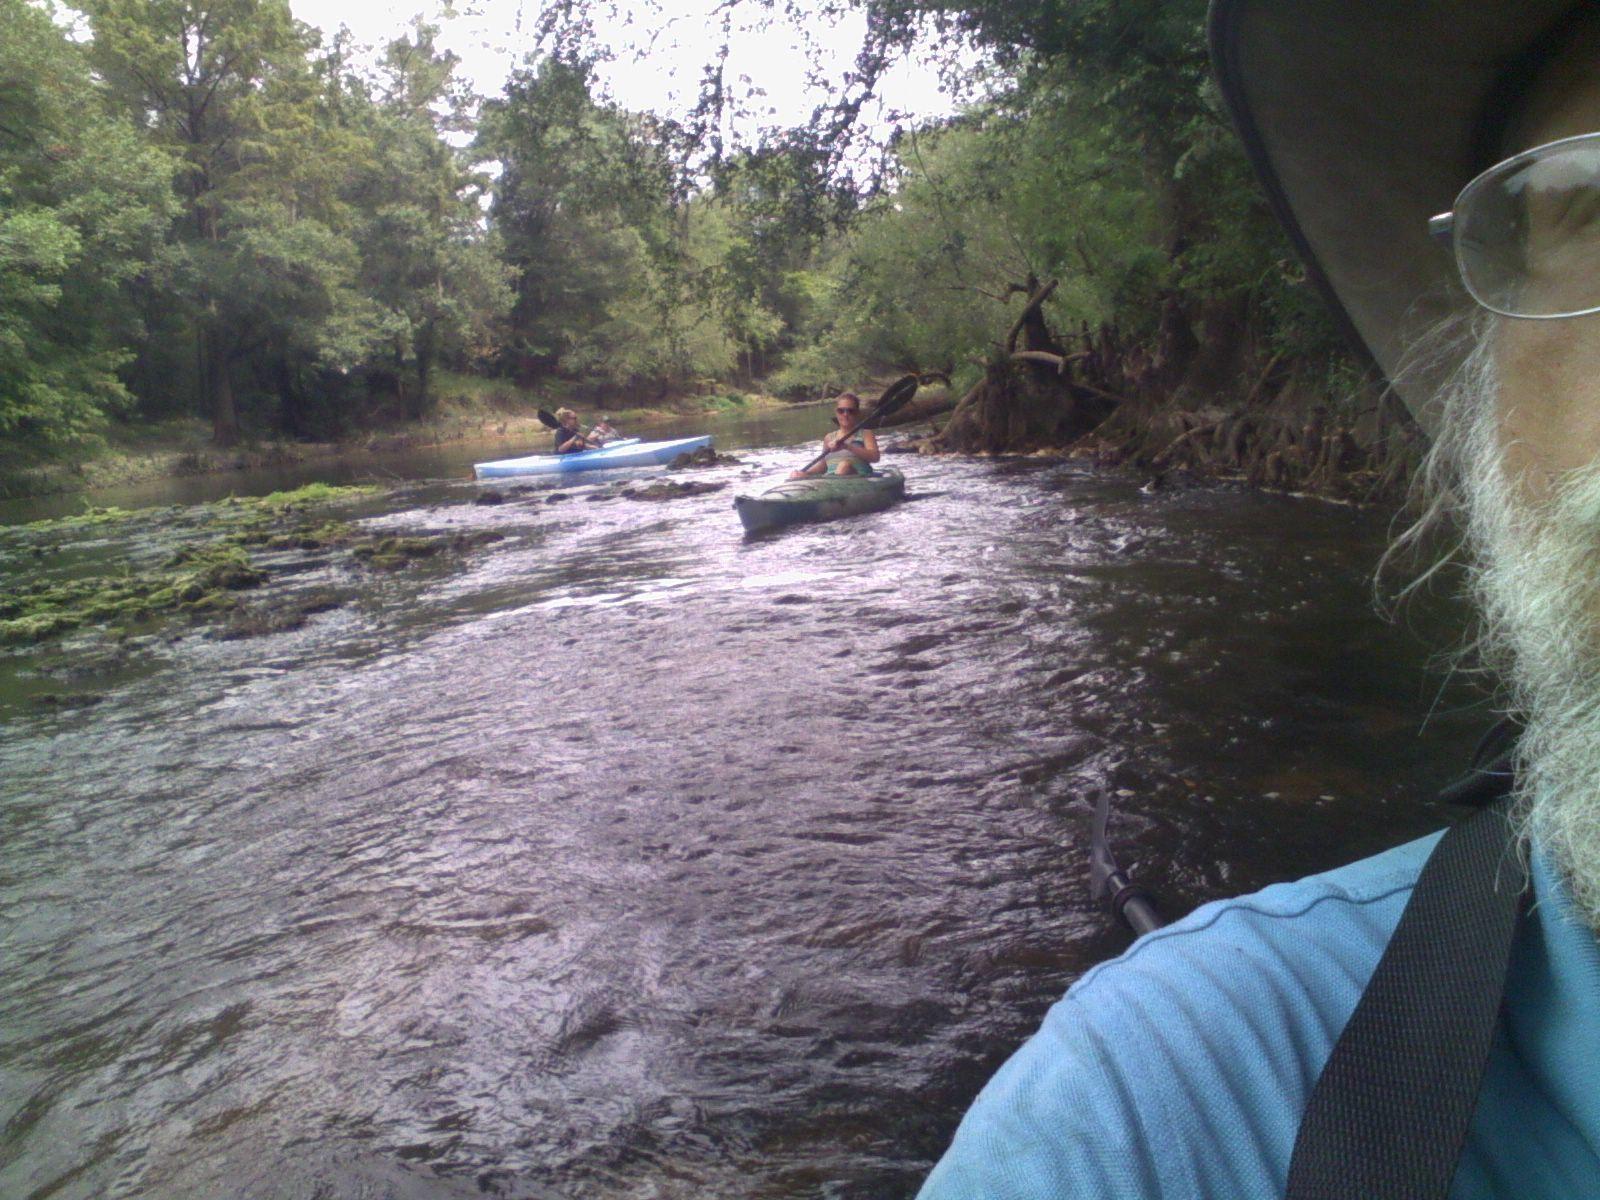 1600x1200 Ashlie tries rapids sideways 30.7954483, -83.4526749, in Sabal Trail @ Withlacoochee @ US 84, by John S. Quarterman, for WWALS.net, 28 August 2015